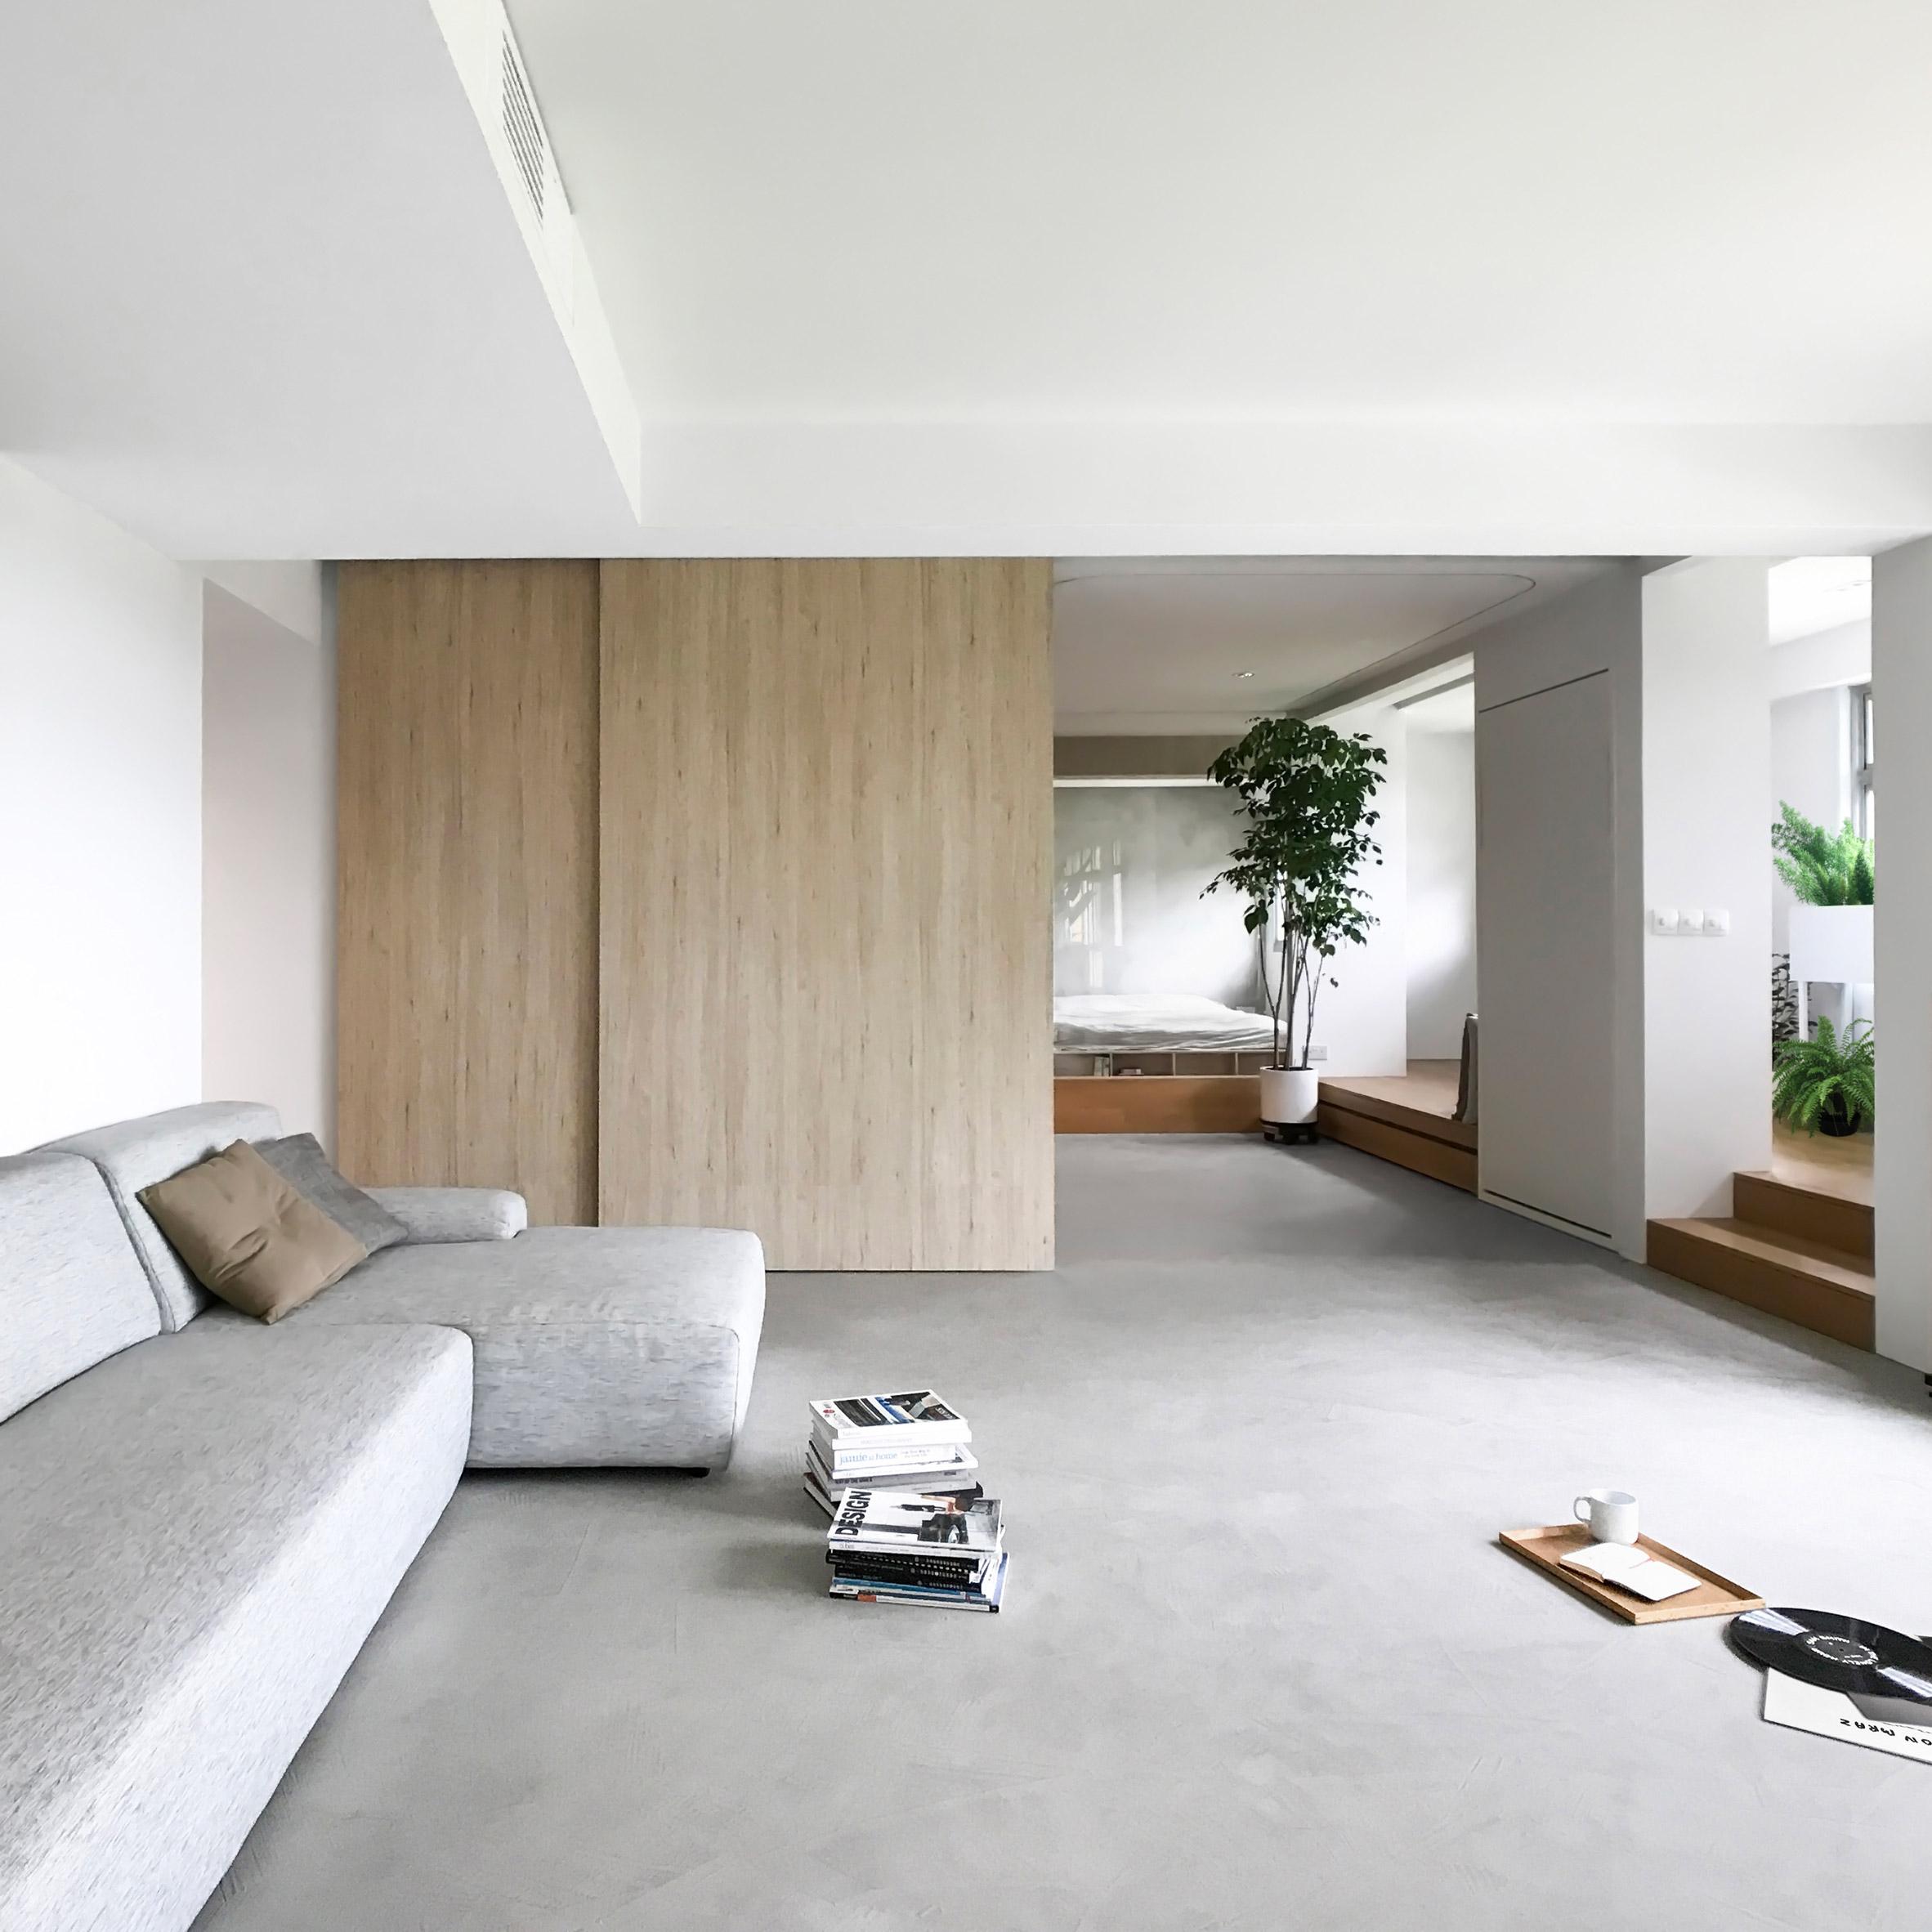 Best Interior Design House: 3NovicesEurope